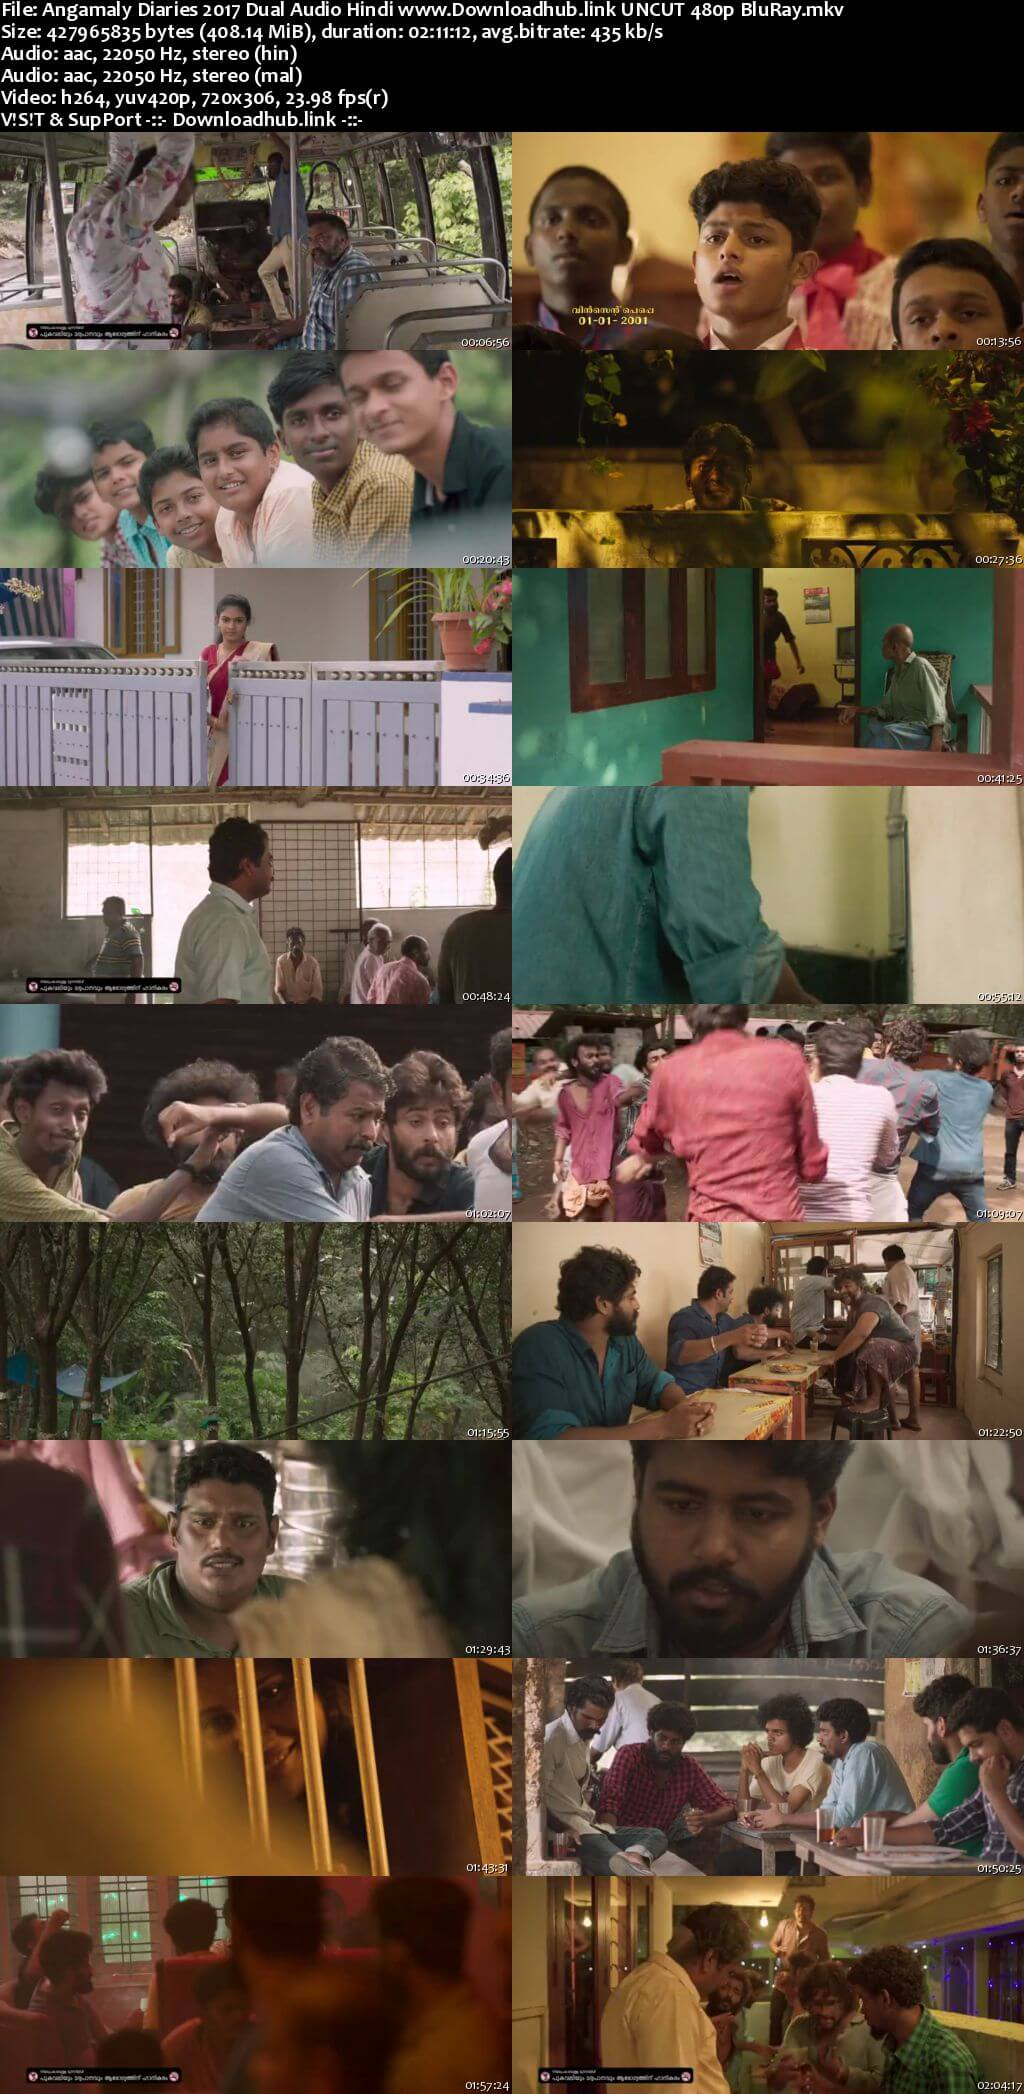 Angamaly Diaries 2017 Hindi Dual Audio 400MB UNCUT BluRay 480p ESubs